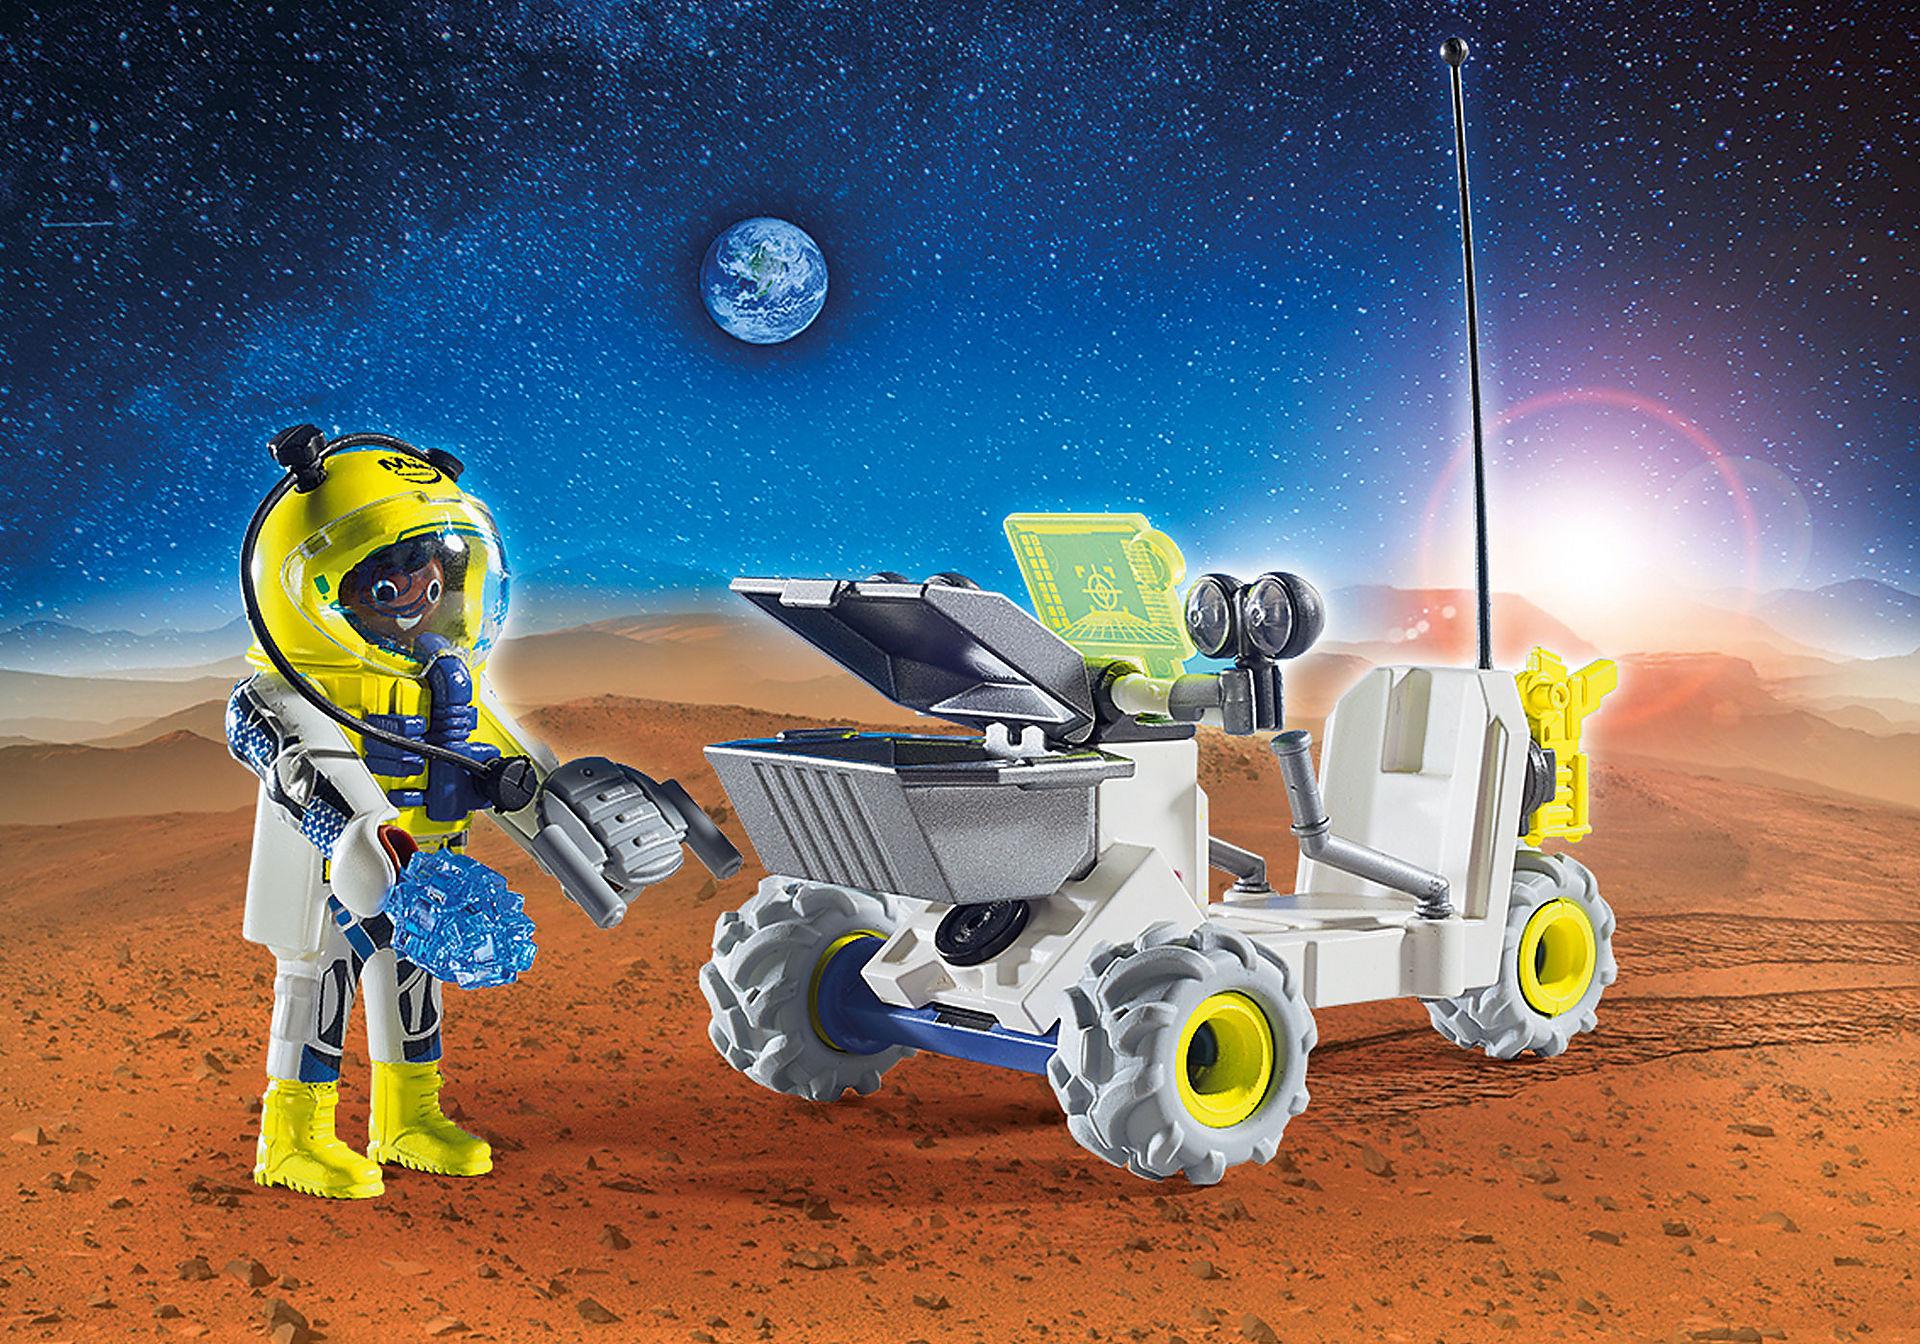 http://media.playmobil.com/i/playmobil/9491_product_extra1/Mars-trike